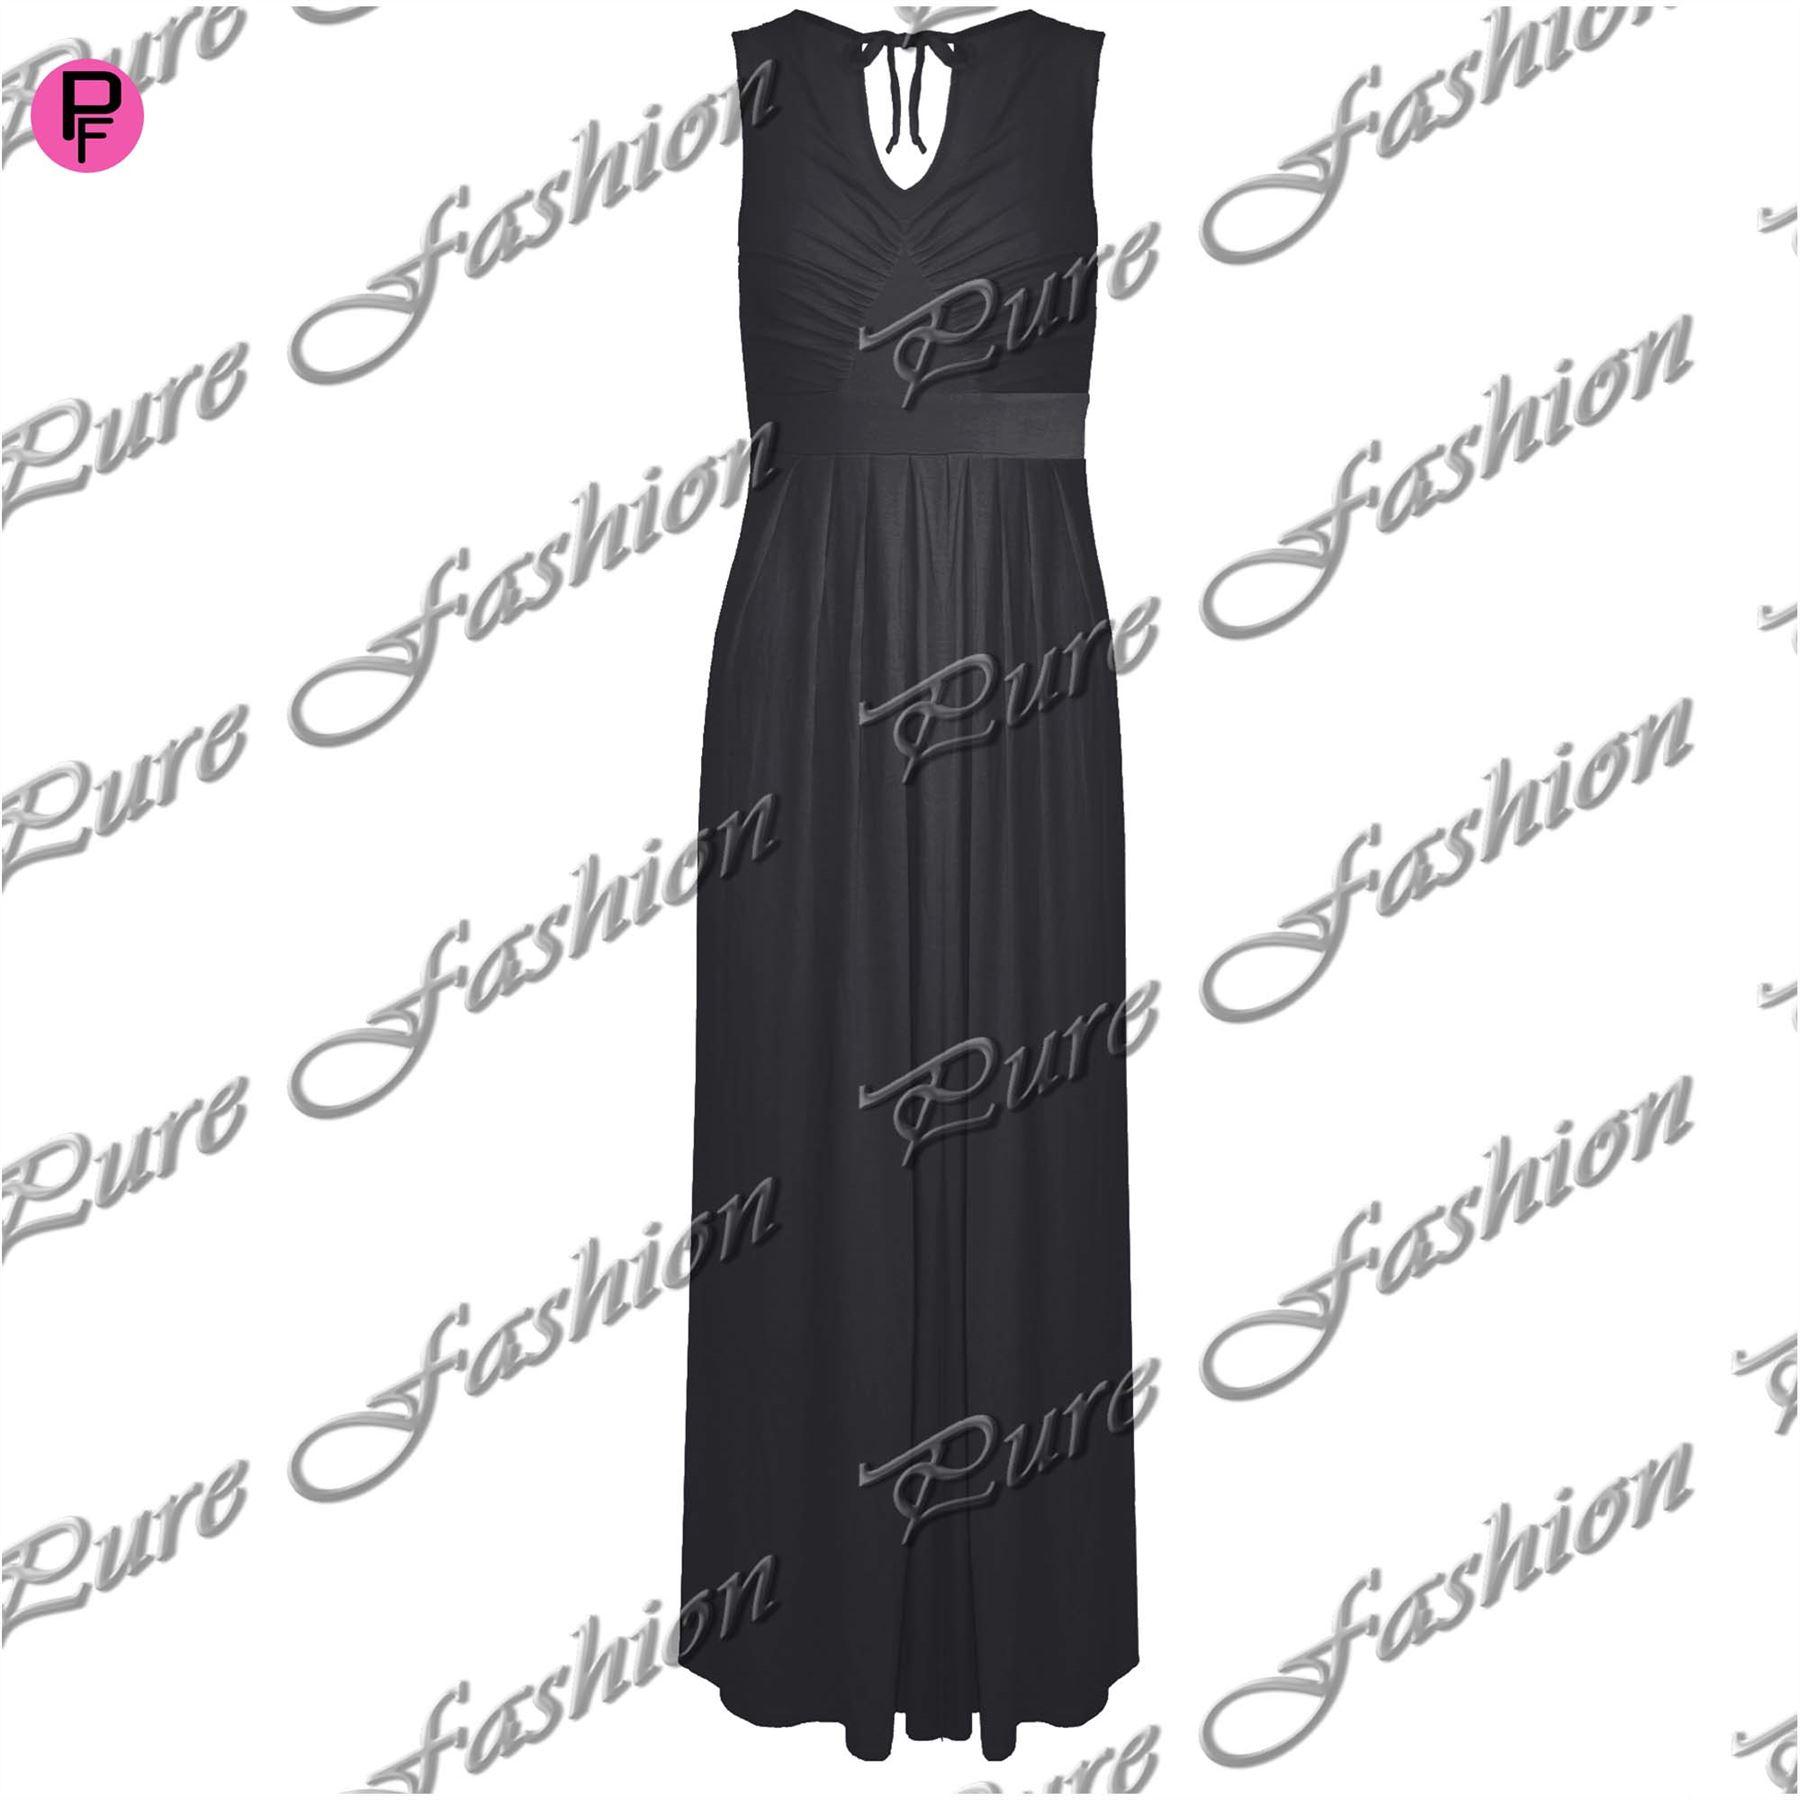 Womens-Ladies-Pleated-Sleeveless-Full-Length-Tie-Back-V-Neck-Flared-Maxi-Dress